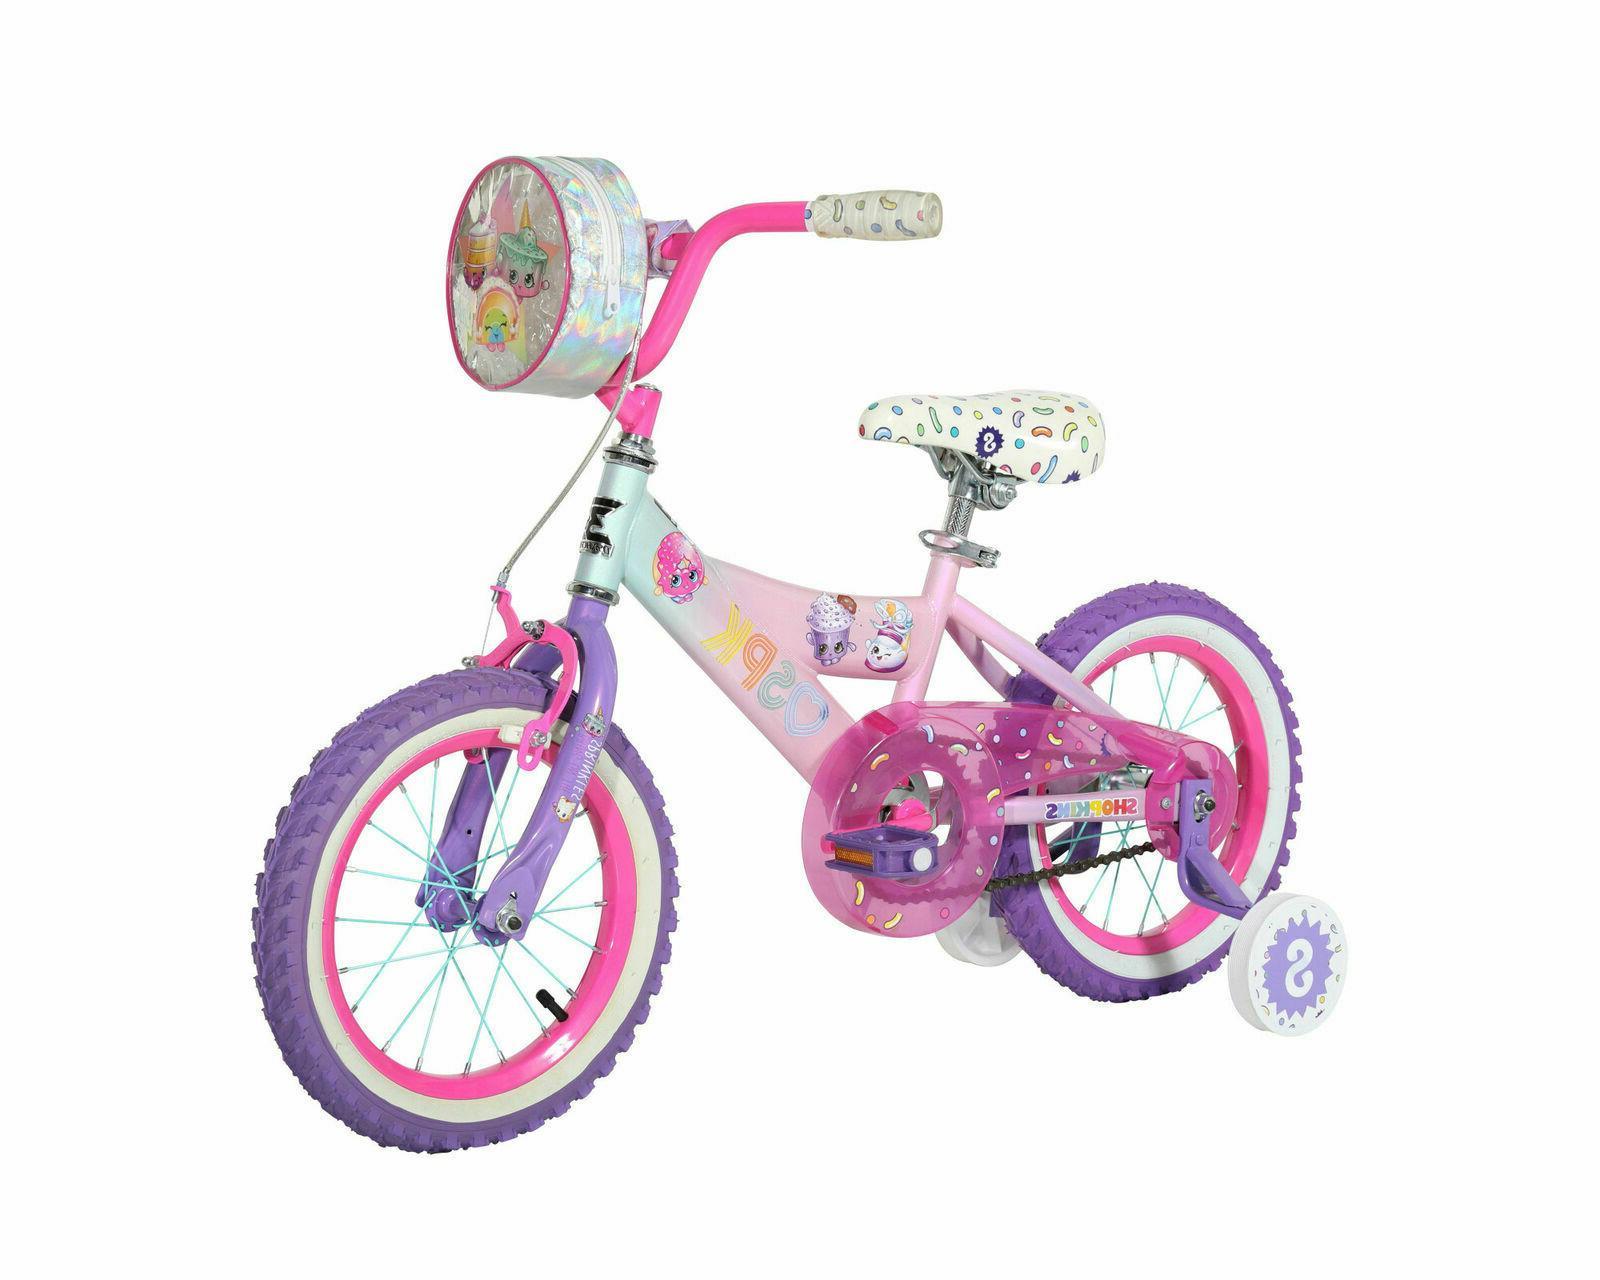 14 kids bike shopkins pink purple